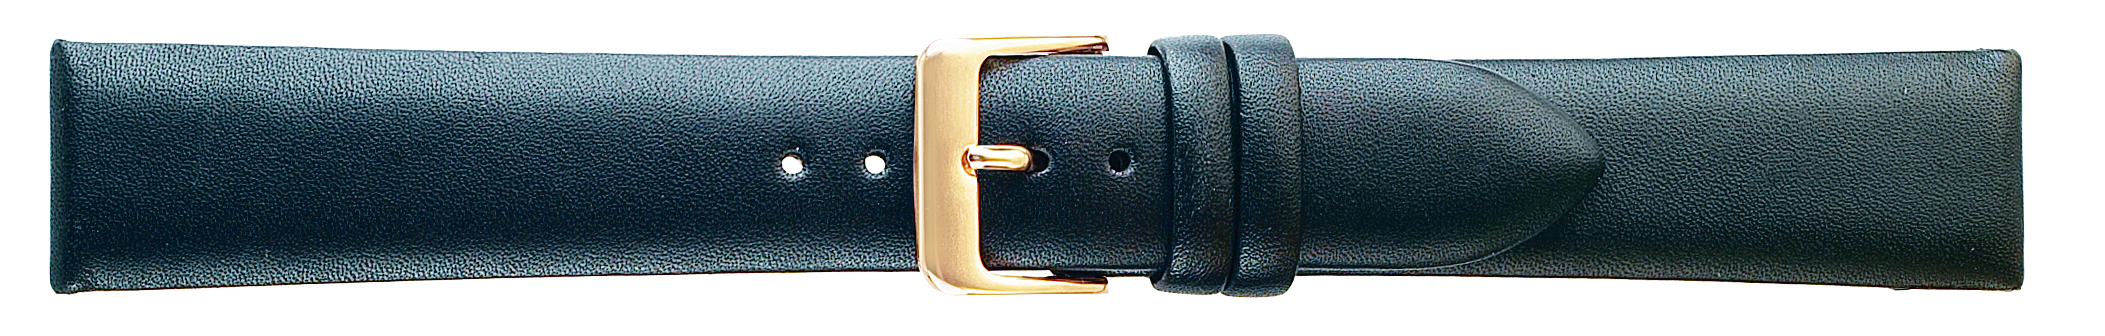 19MM Black Luxury Calf Leather Strap-0